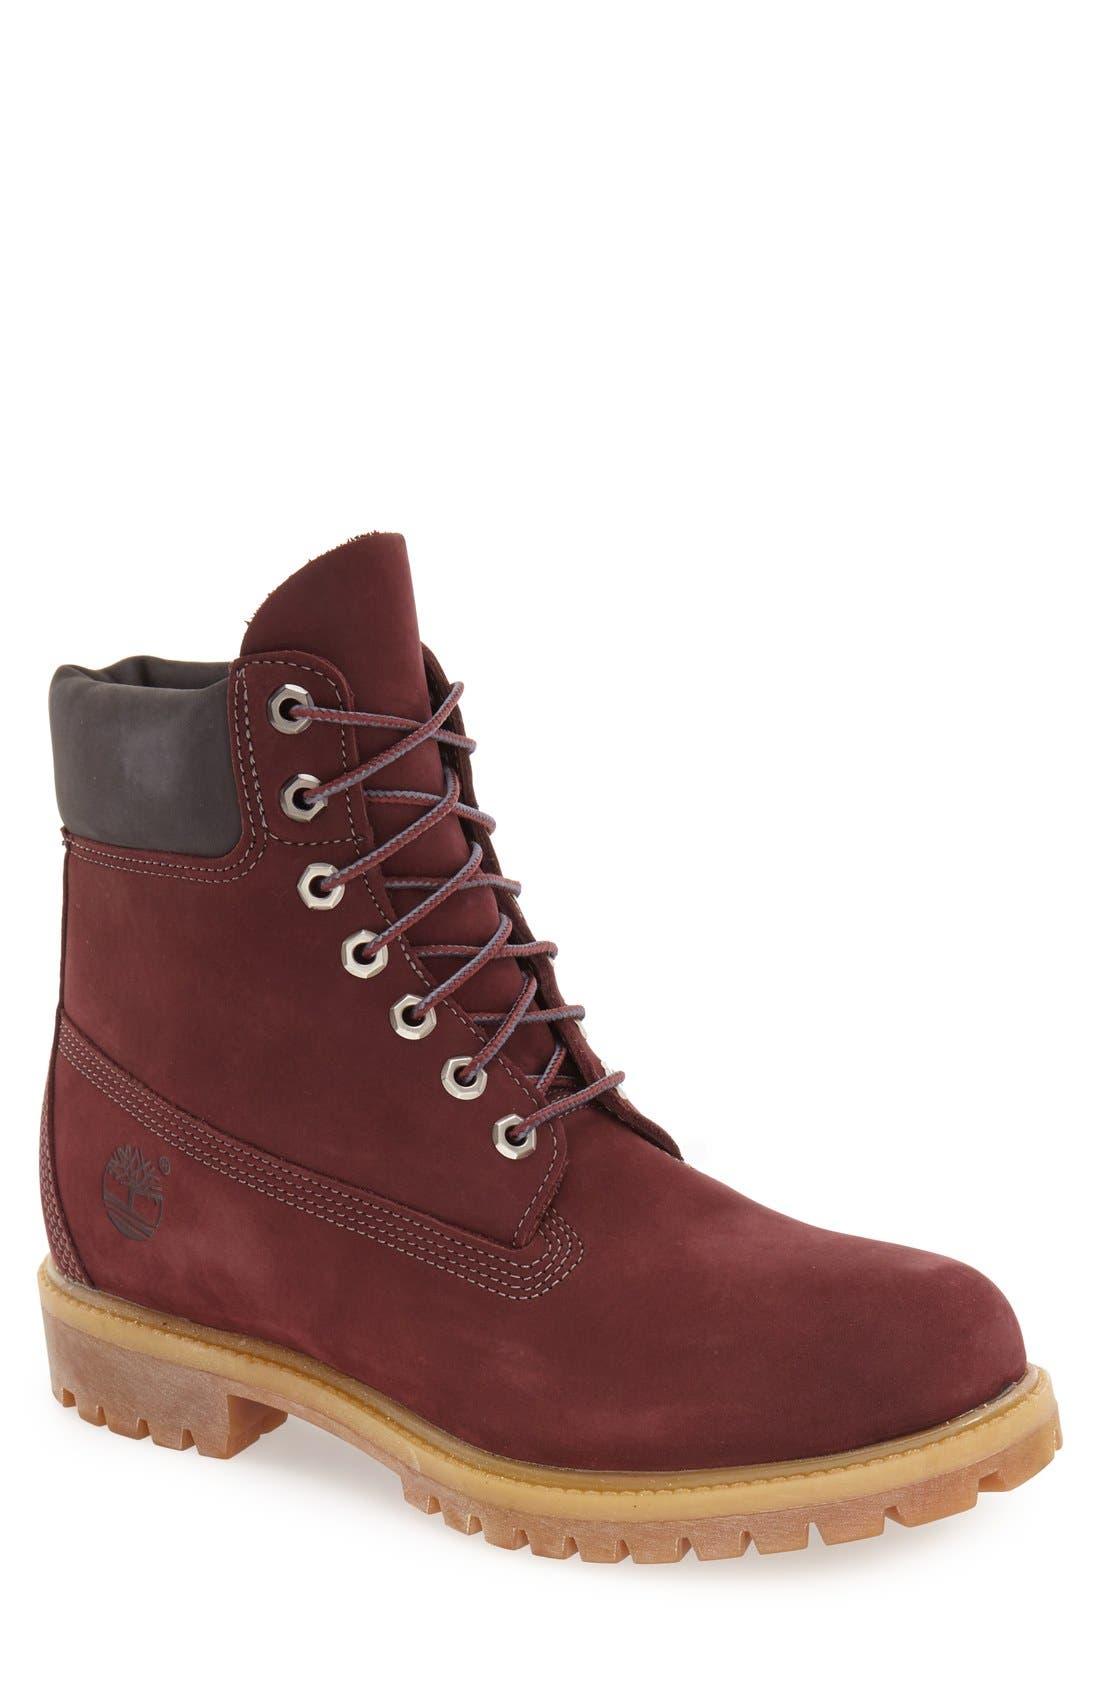 Main Image - Timberland 'Autumn Mashup' Waterproof Boot (Men)